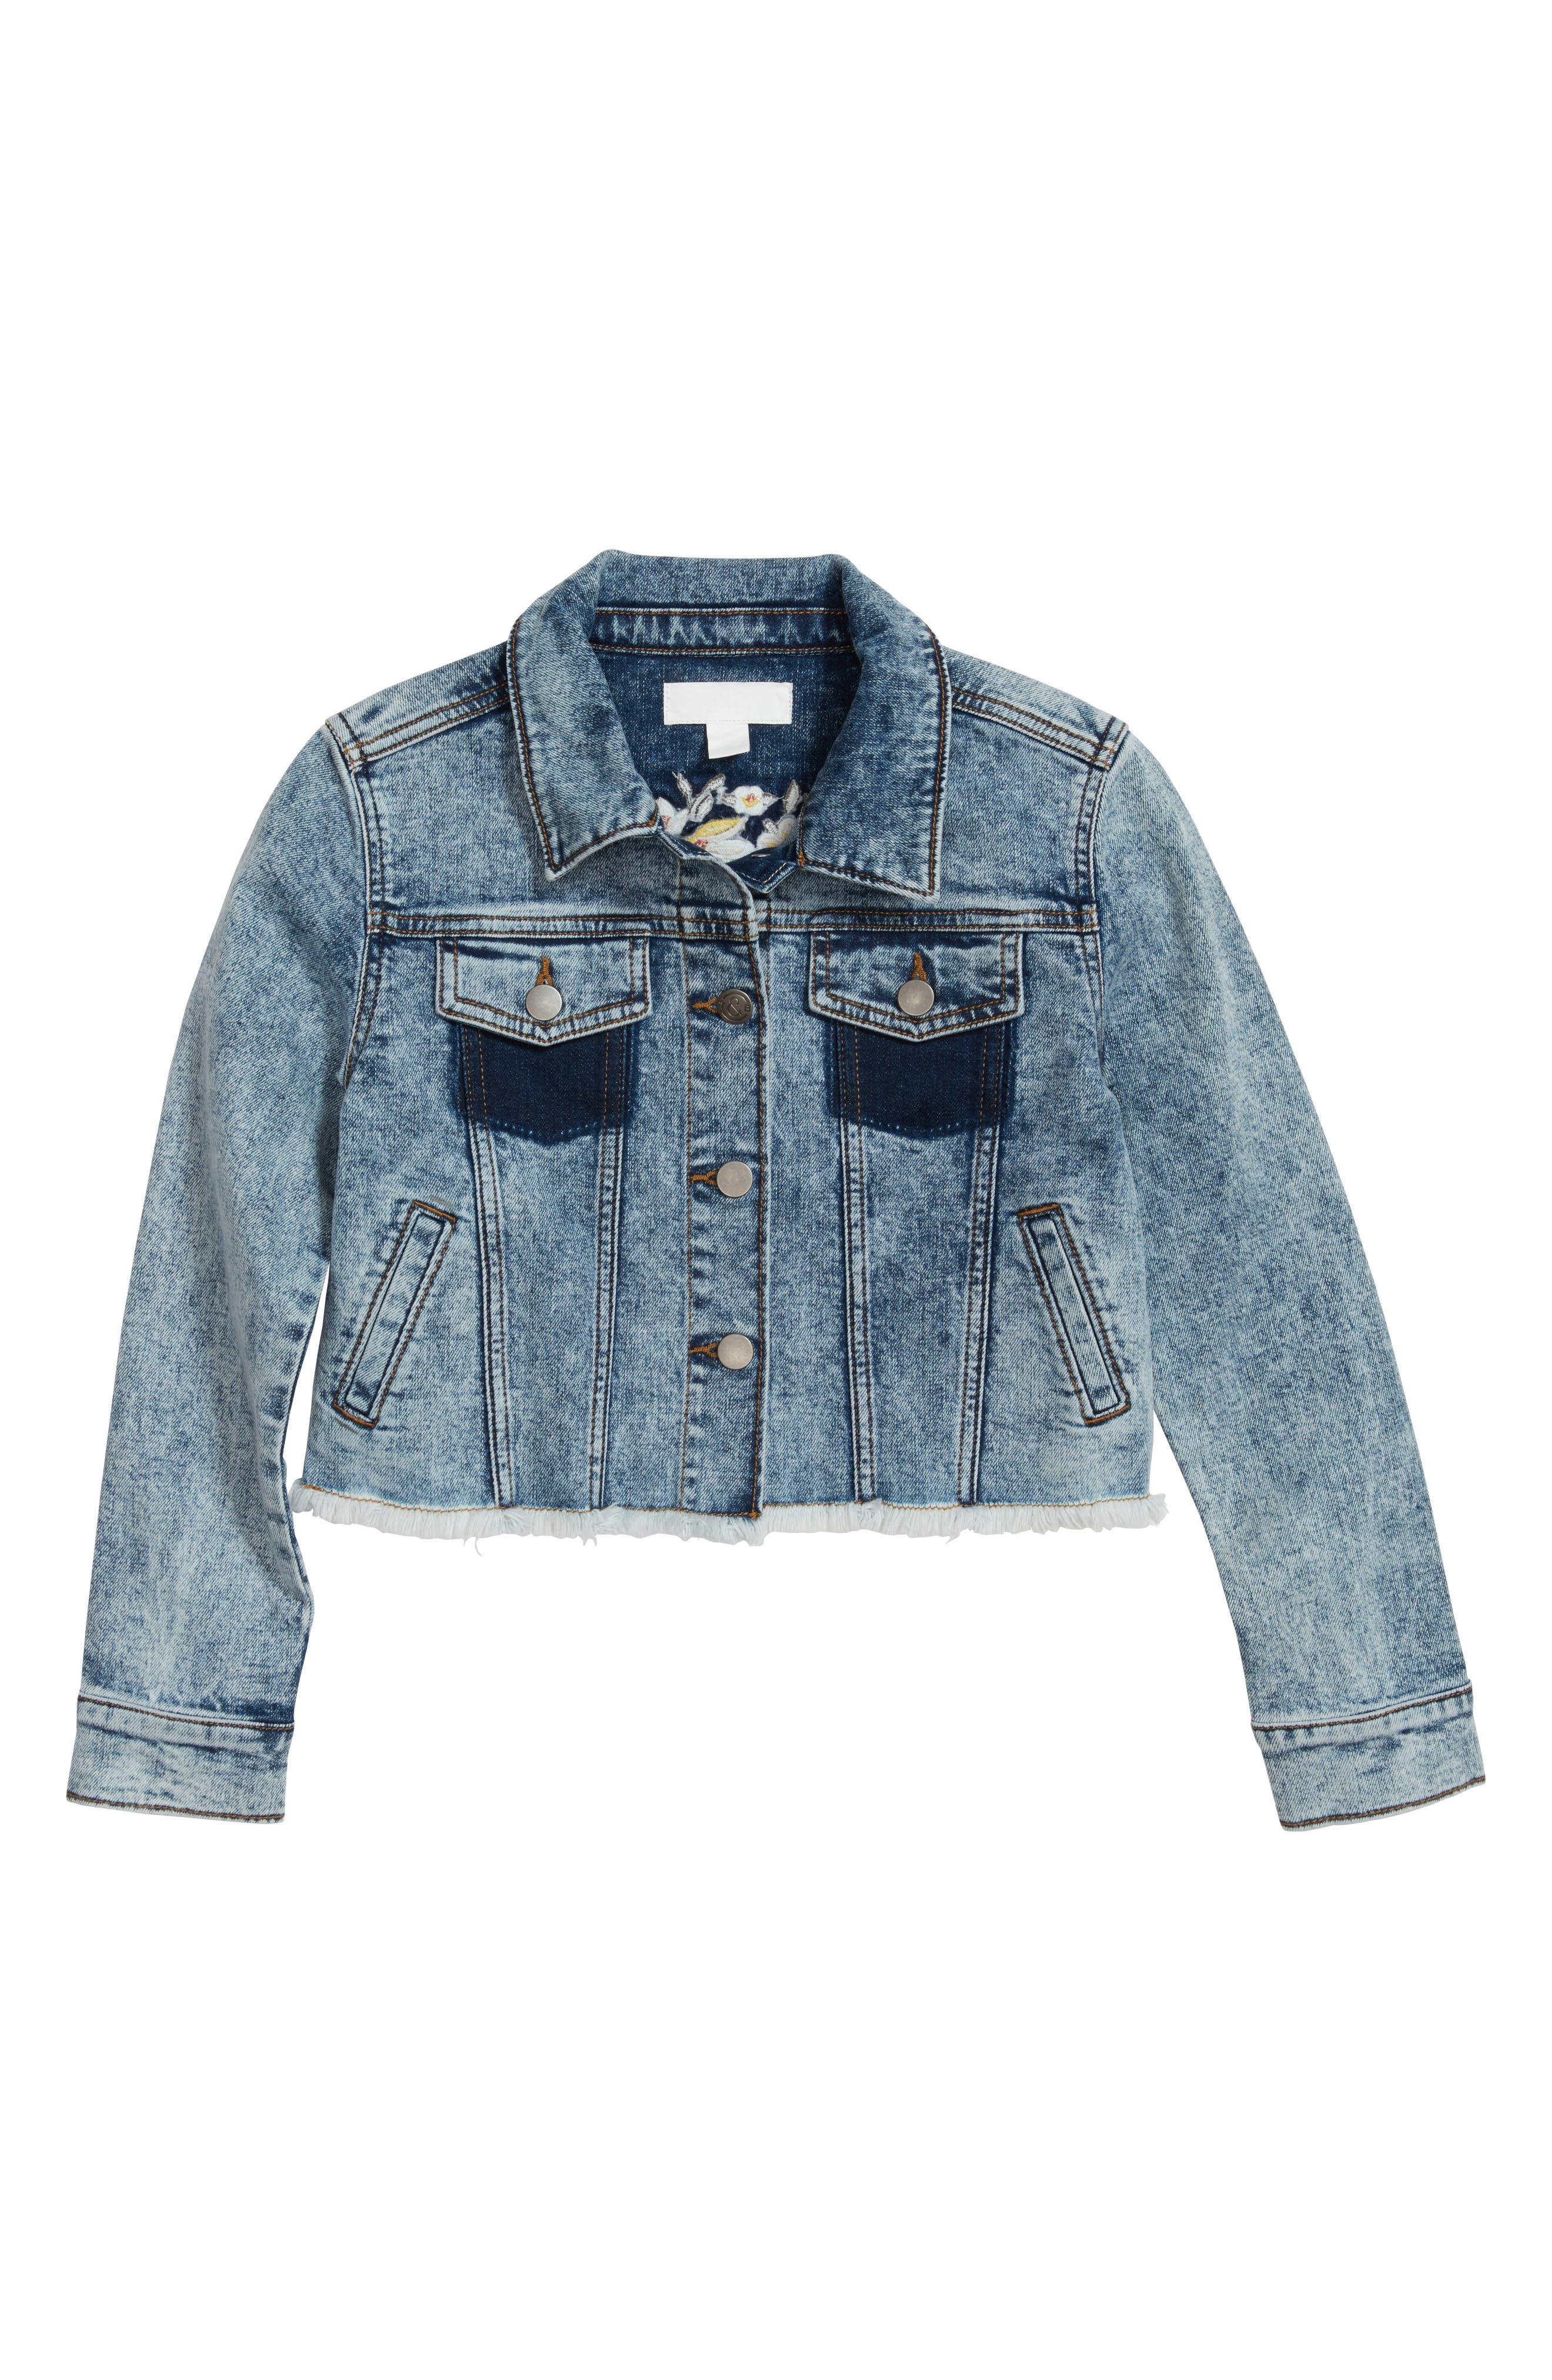 Embroidered Crop Denim Jacket,                         Main,                         color, Stone Cold Wash